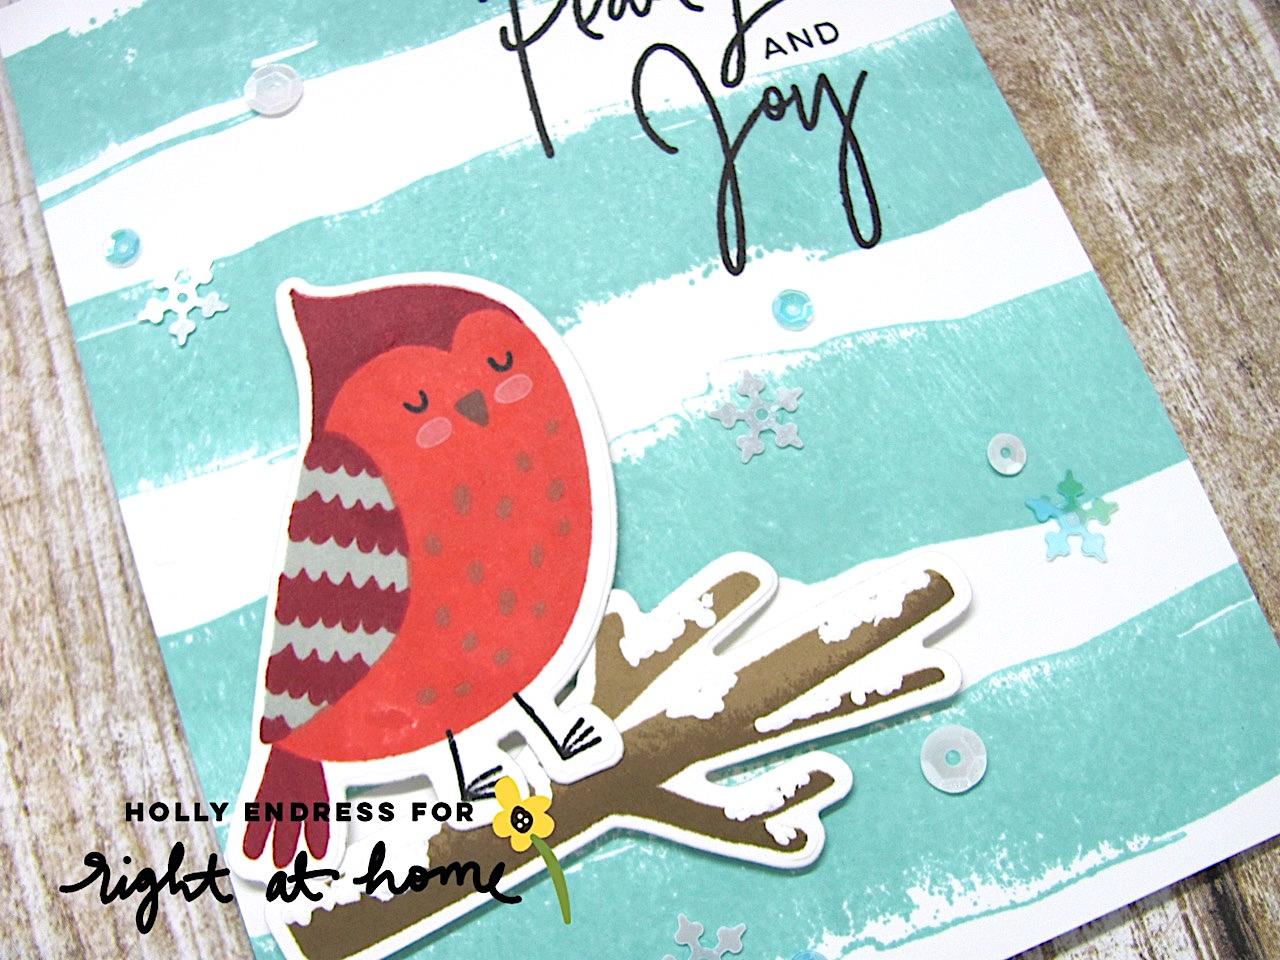 Peace Love Joy Cozy Cardinal Card by Holly // rightathomeshop.com/blog